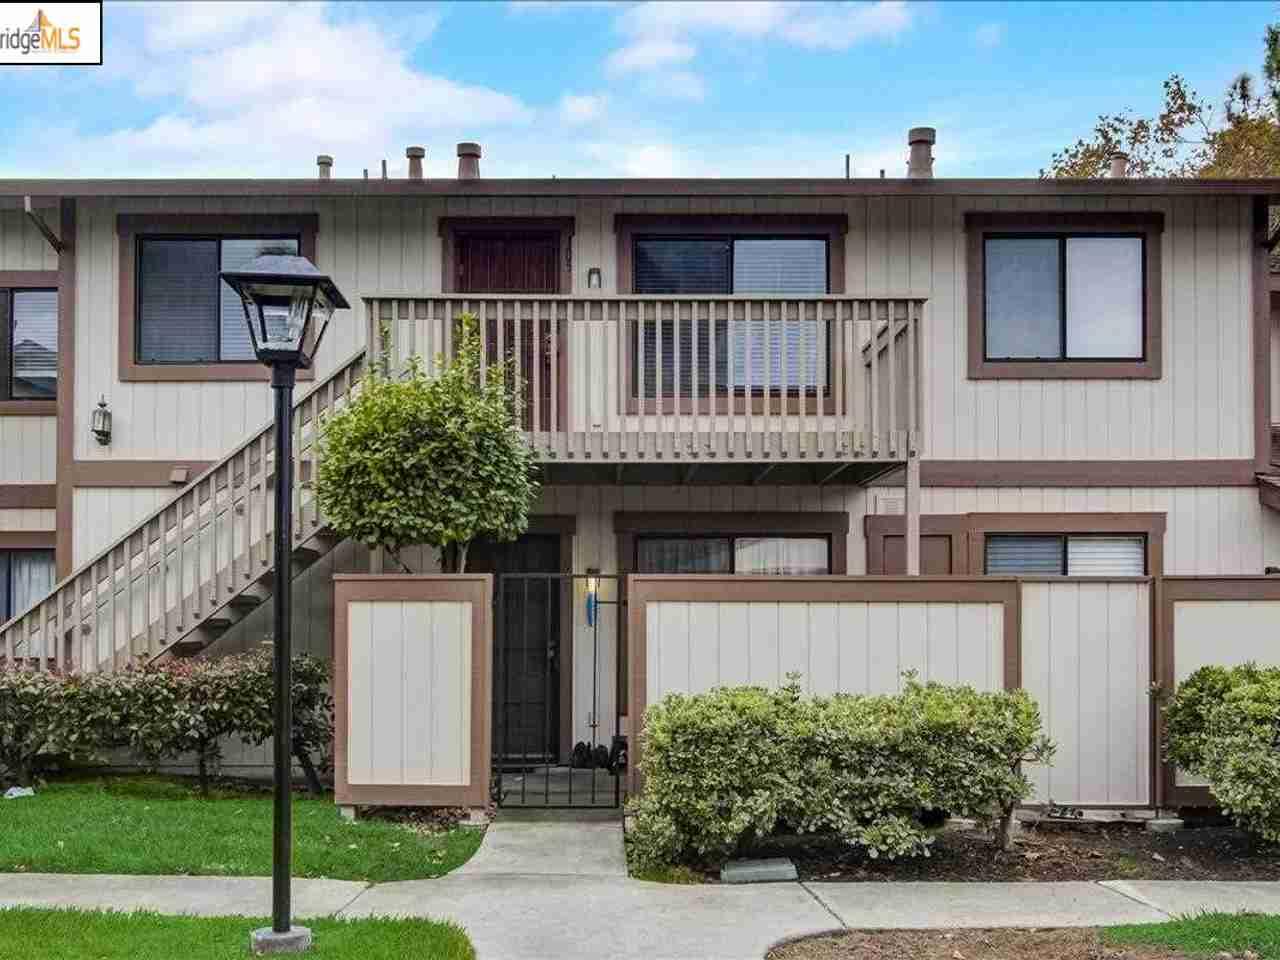 105 Donoso Plaza Union City, CA, 94587